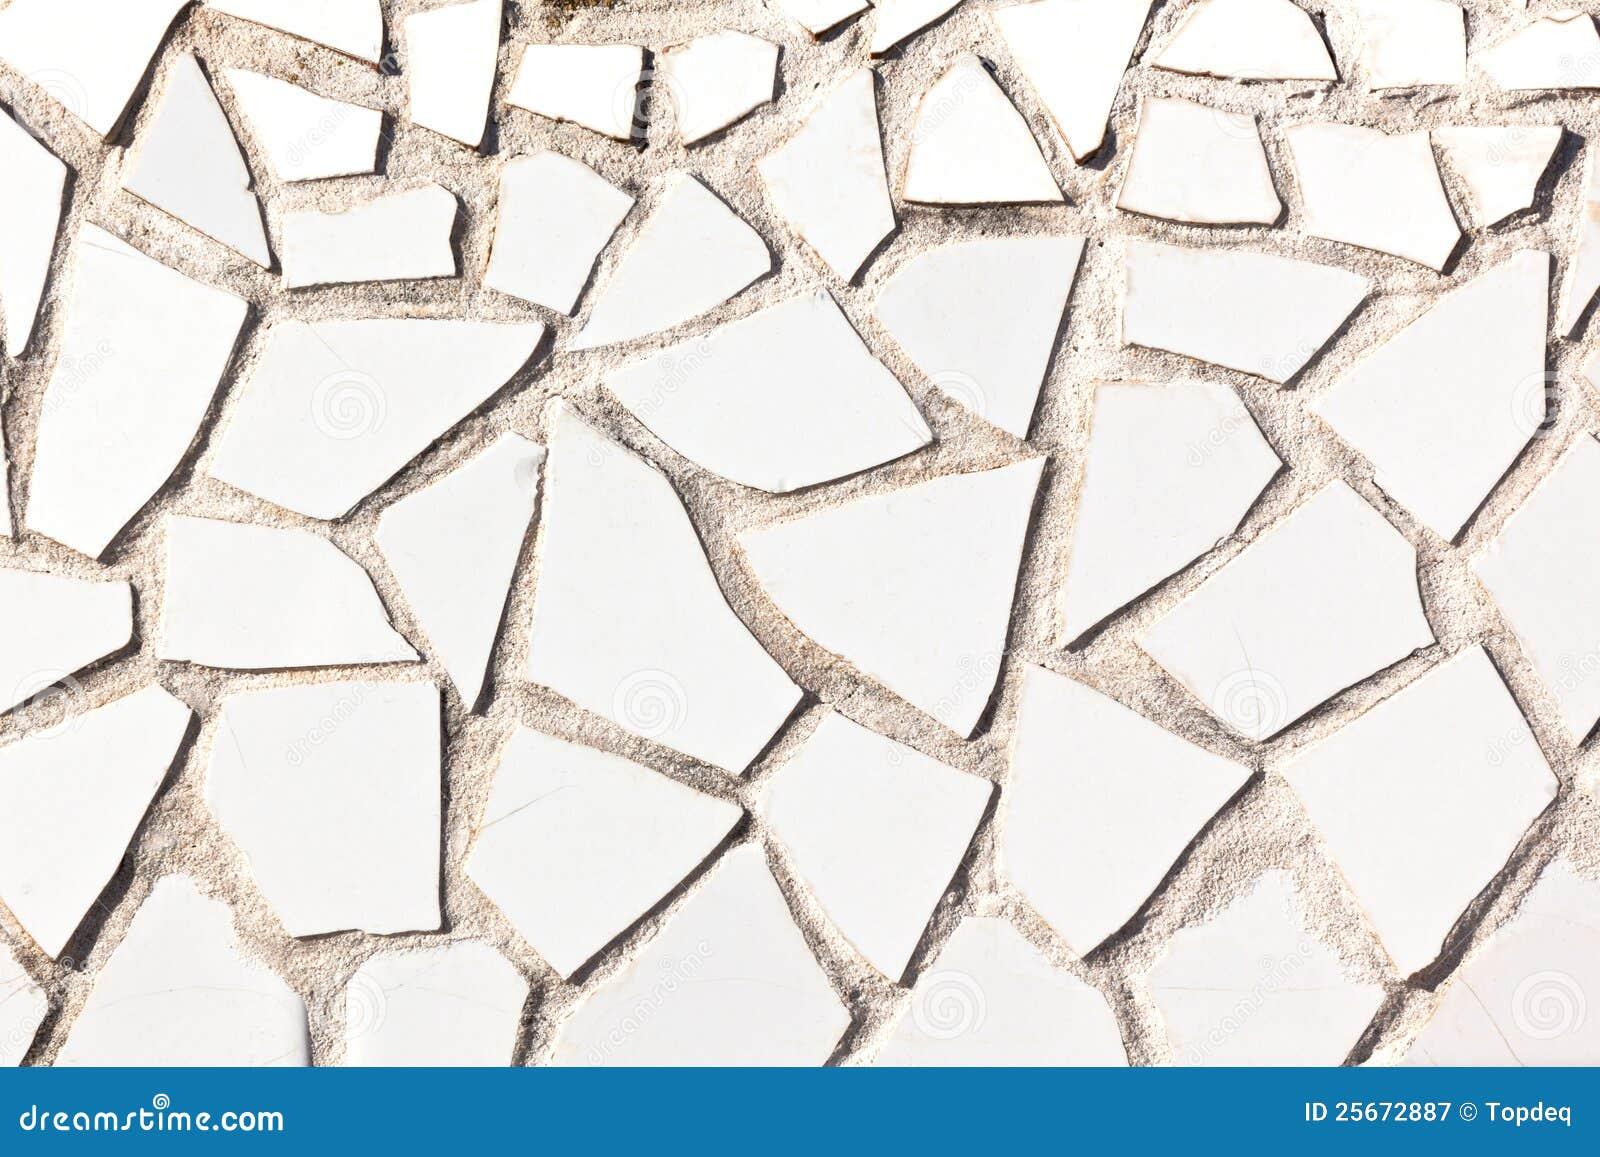 Broken Tile Mosaic Background Stock Image Image 25672887